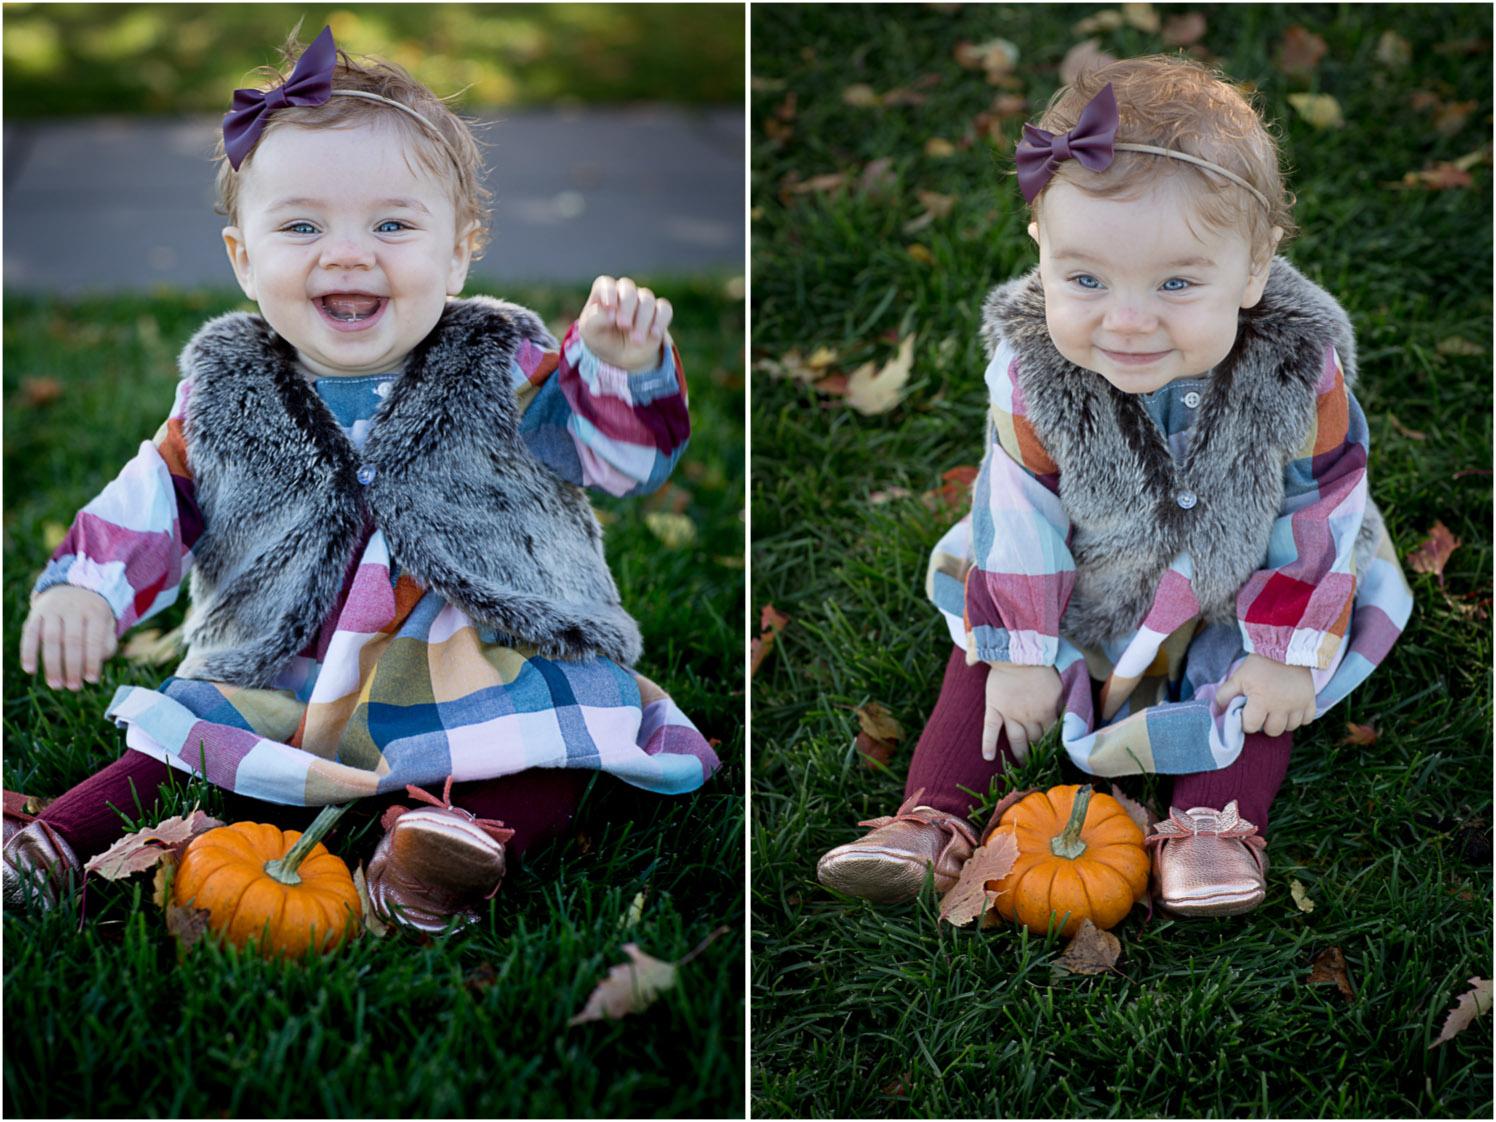 02-minnesota-fall-family-session-9-nine-month-old-girl-mill-city-minneapolis-mahonen-photography-pumpkin.jpg